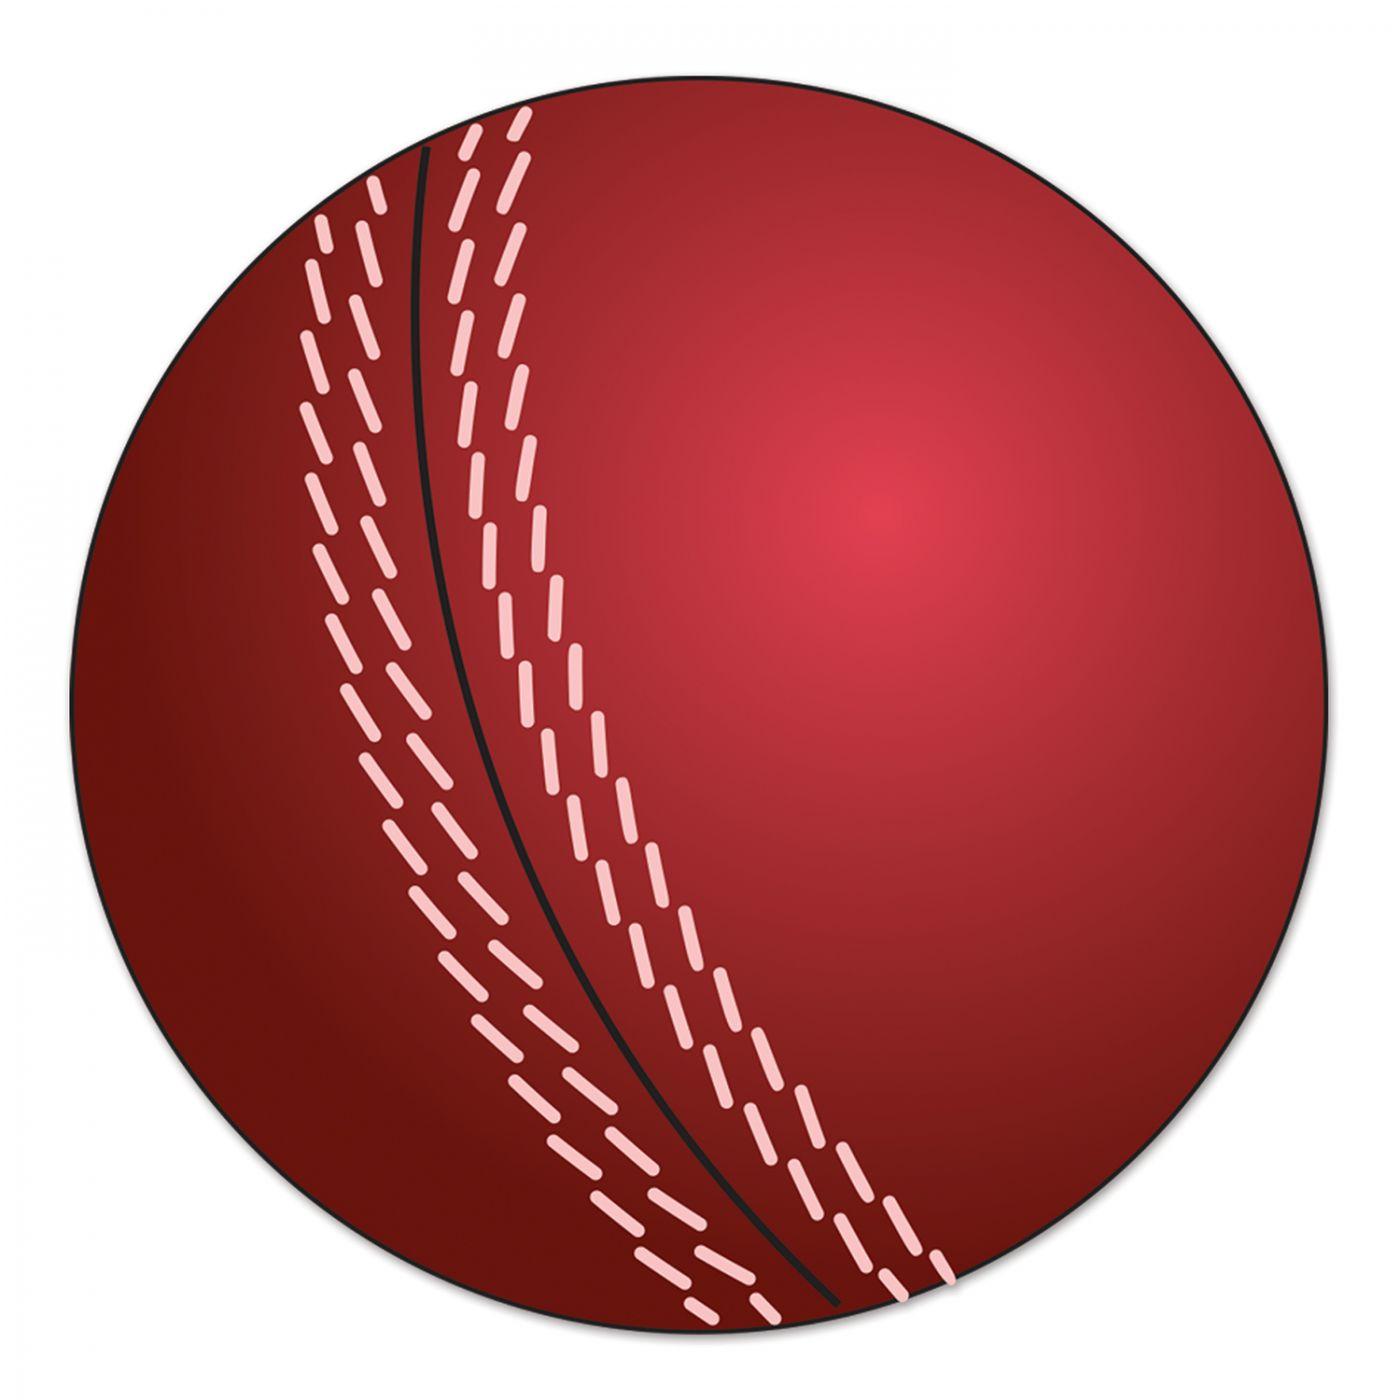 Cricket Ball Cutout image